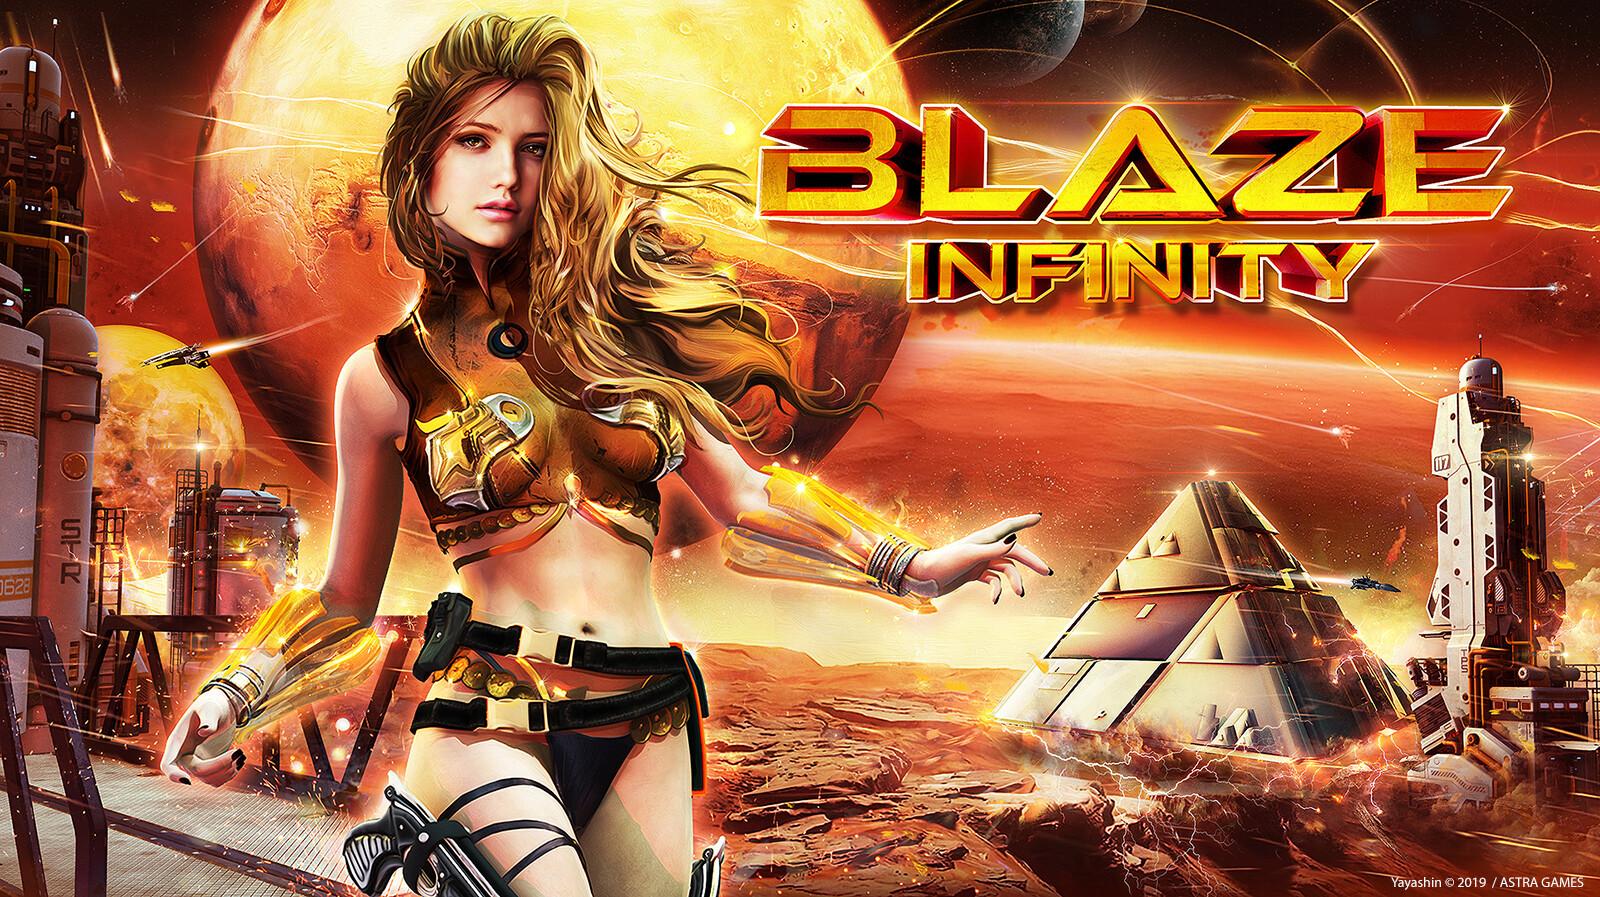 BLAZE Topscreen (Casino games)